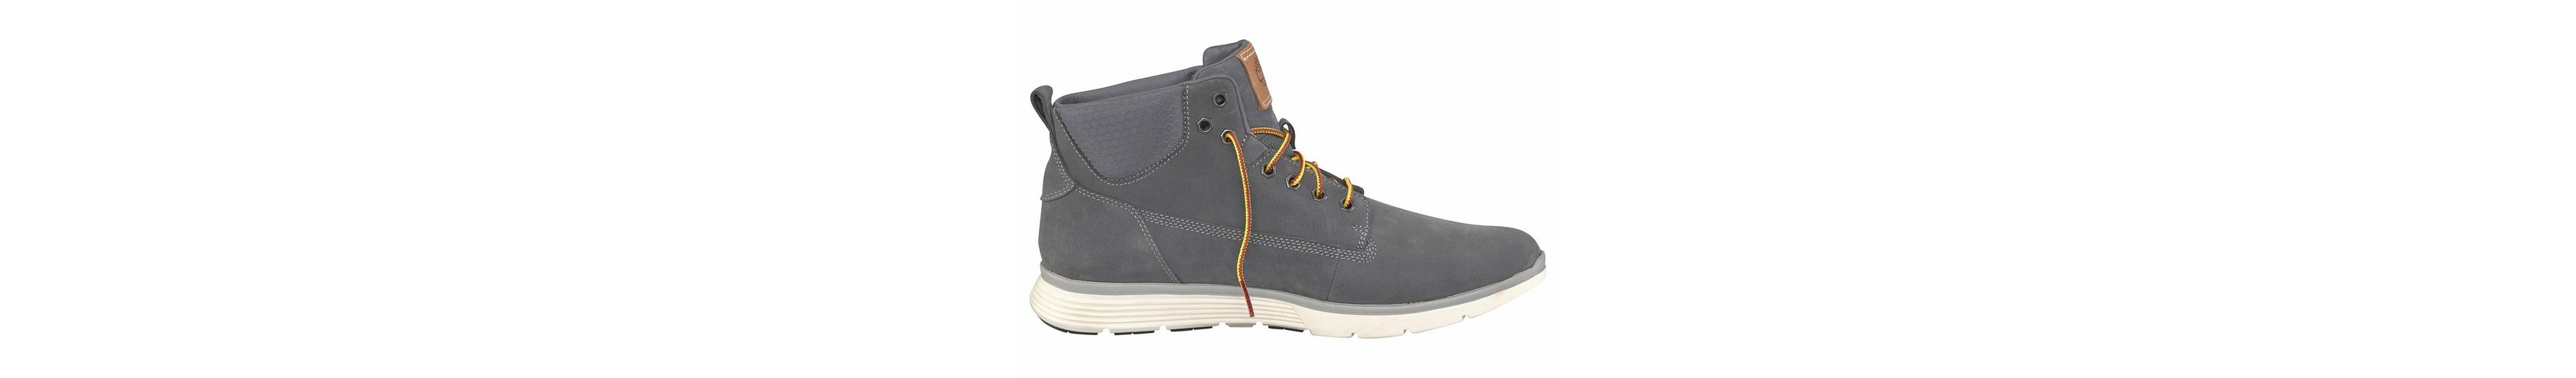 Timberland Killington Chukka M Sneaker Outlet Besten Großhandel Spielraum Großhandelspreis Gute Qualität Auslass-Websites Z3zHhMuzH